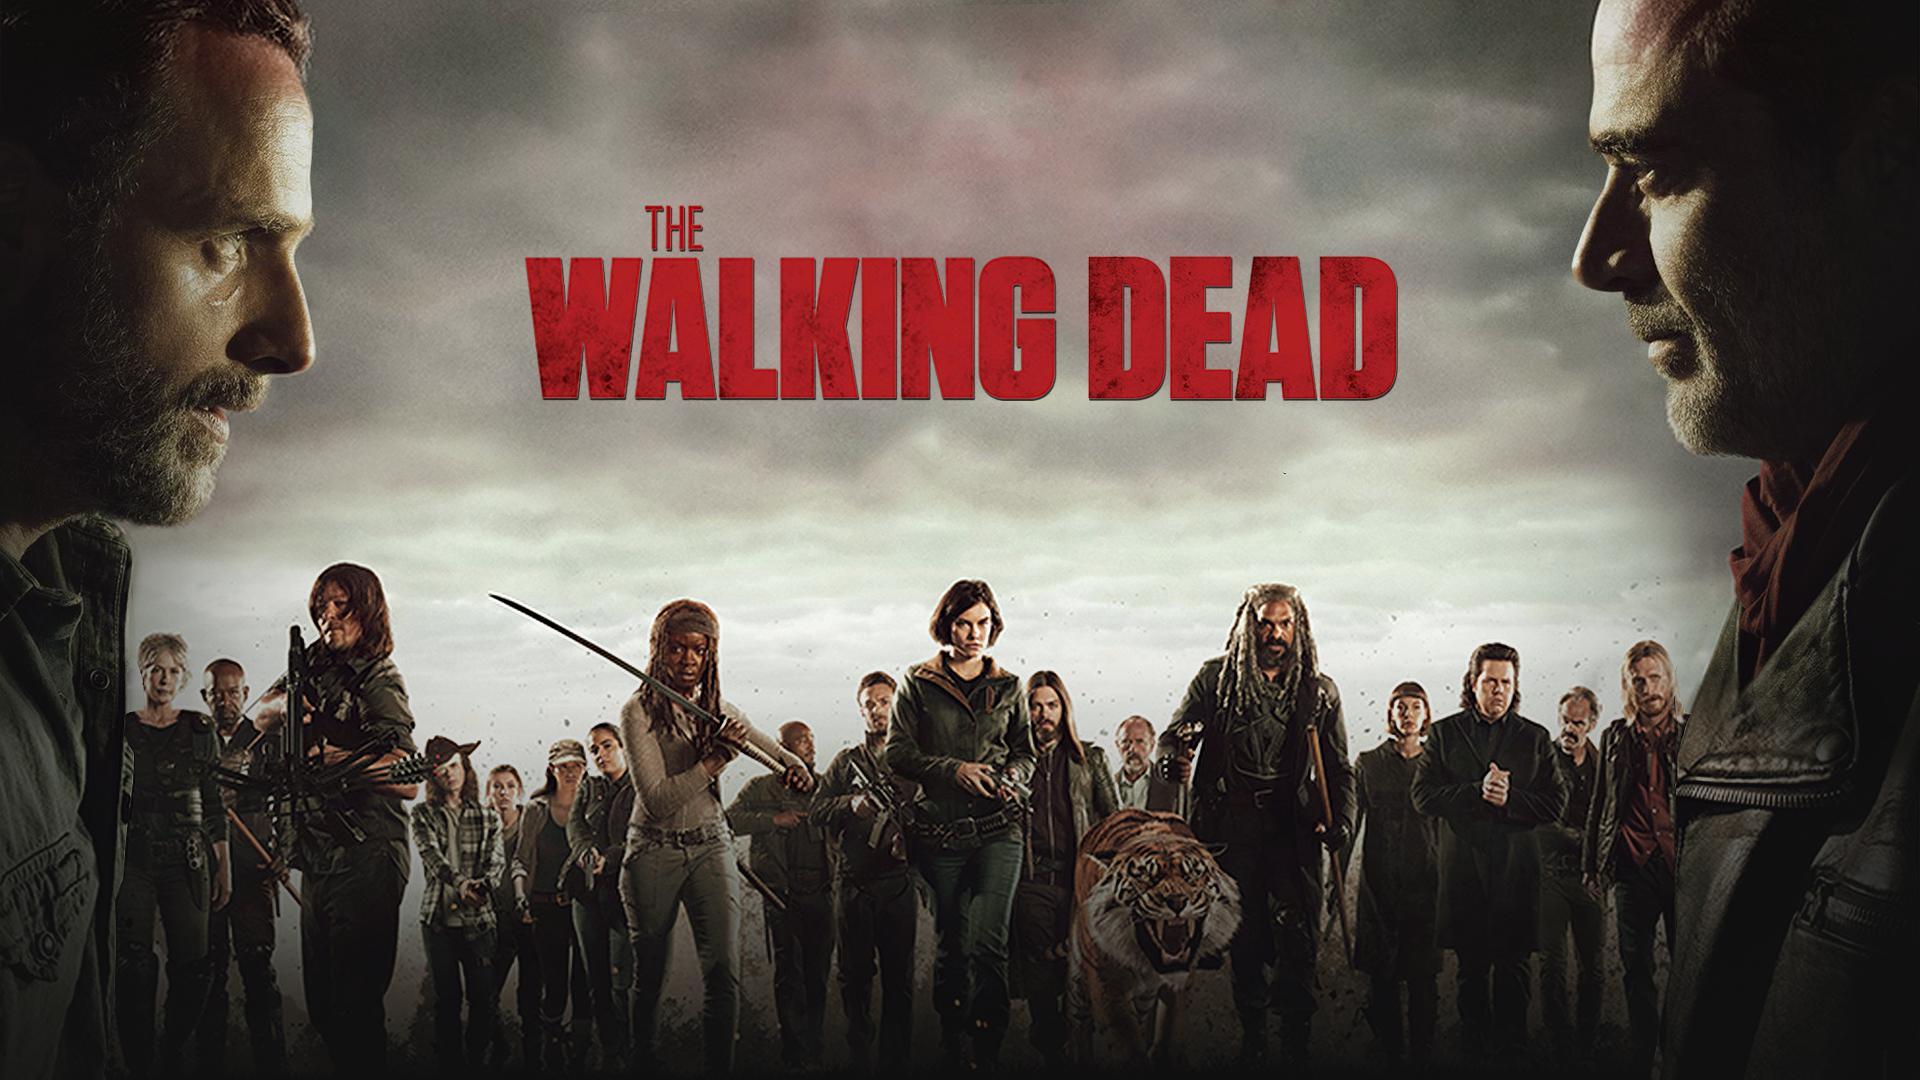 TWD season 8 poster